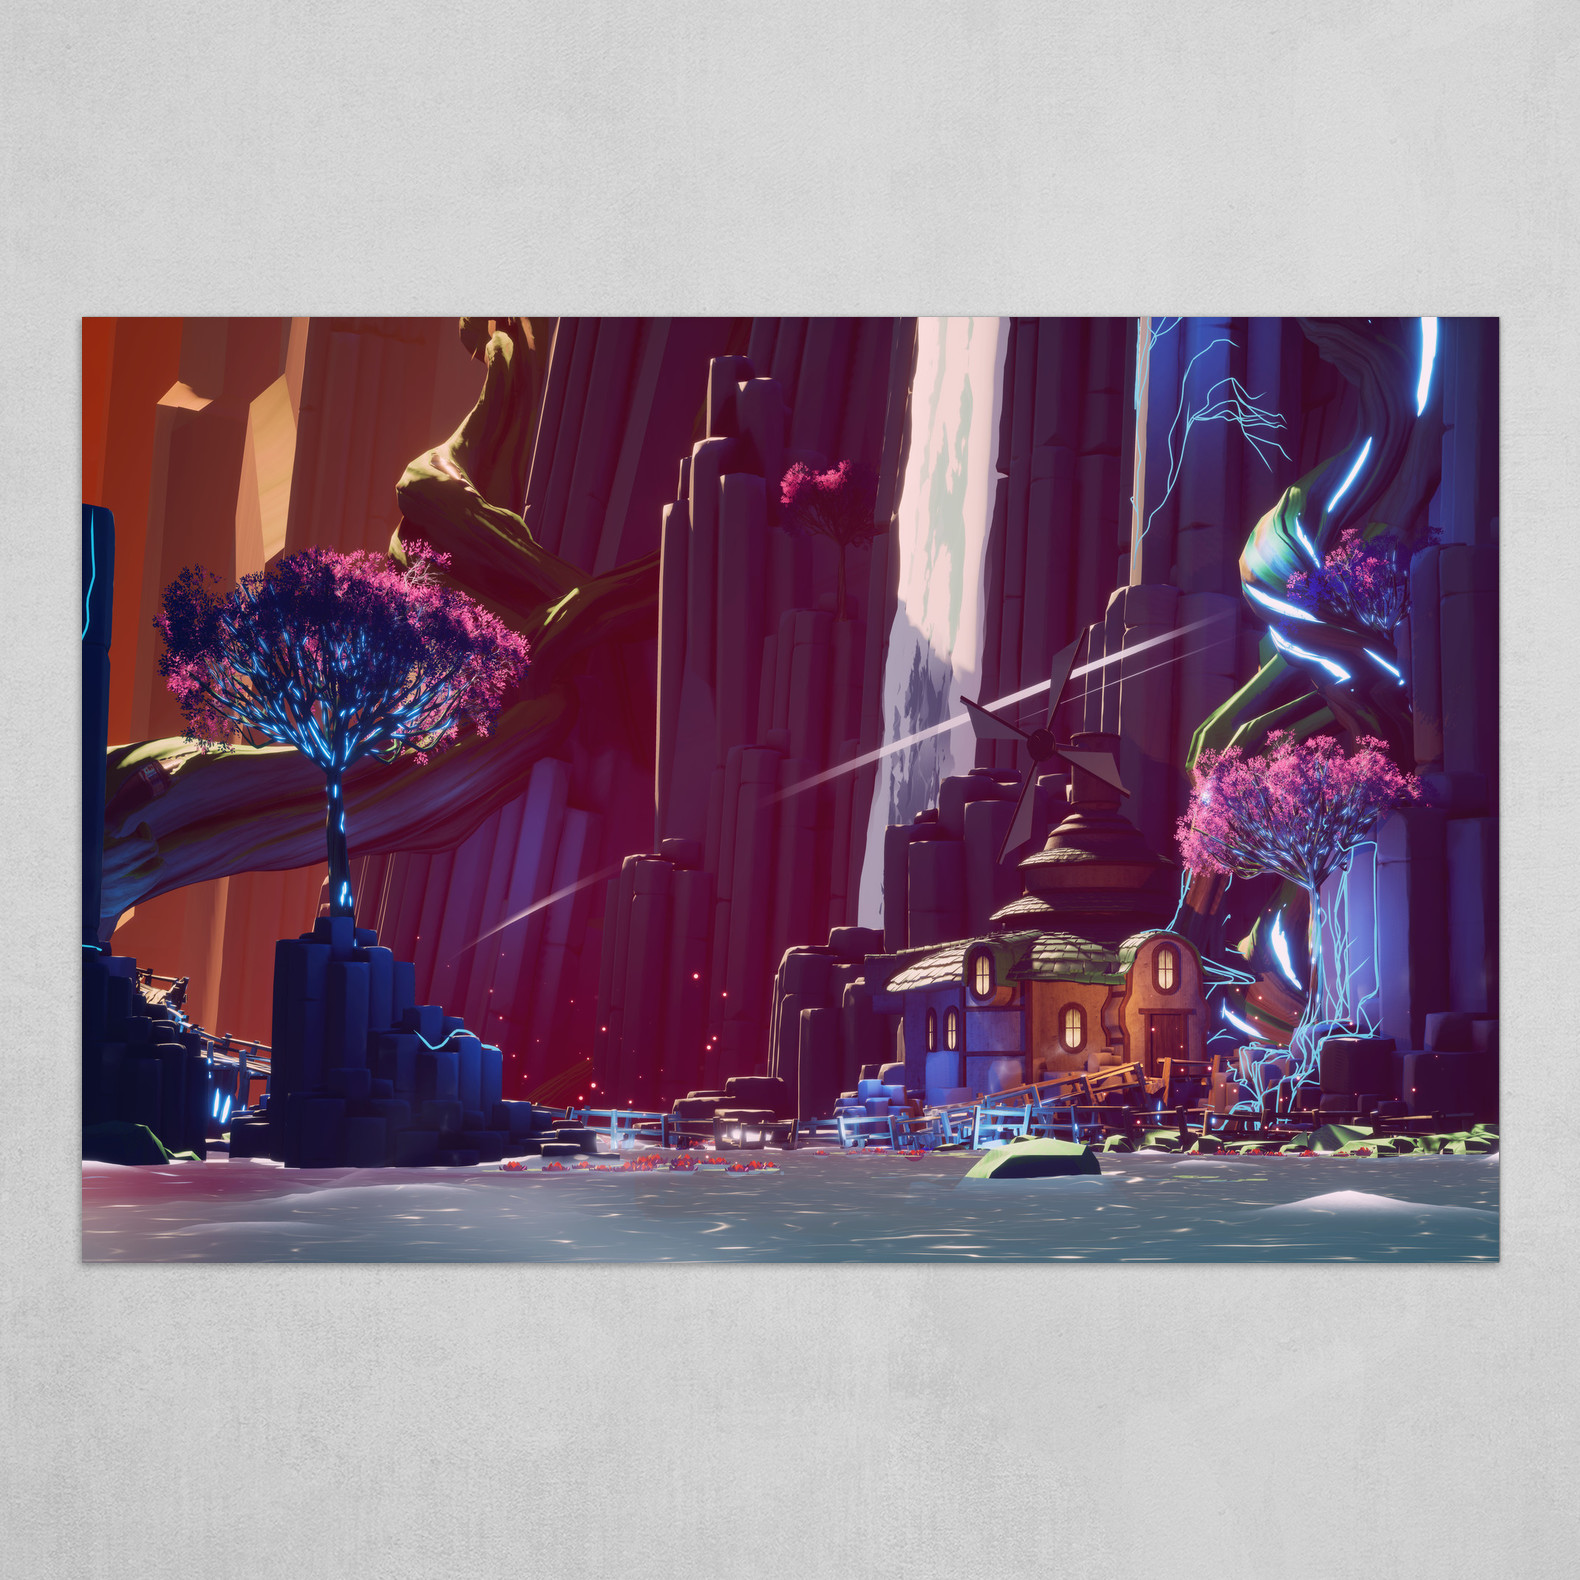 Chris Radsby - Beyond Human - Horizontal